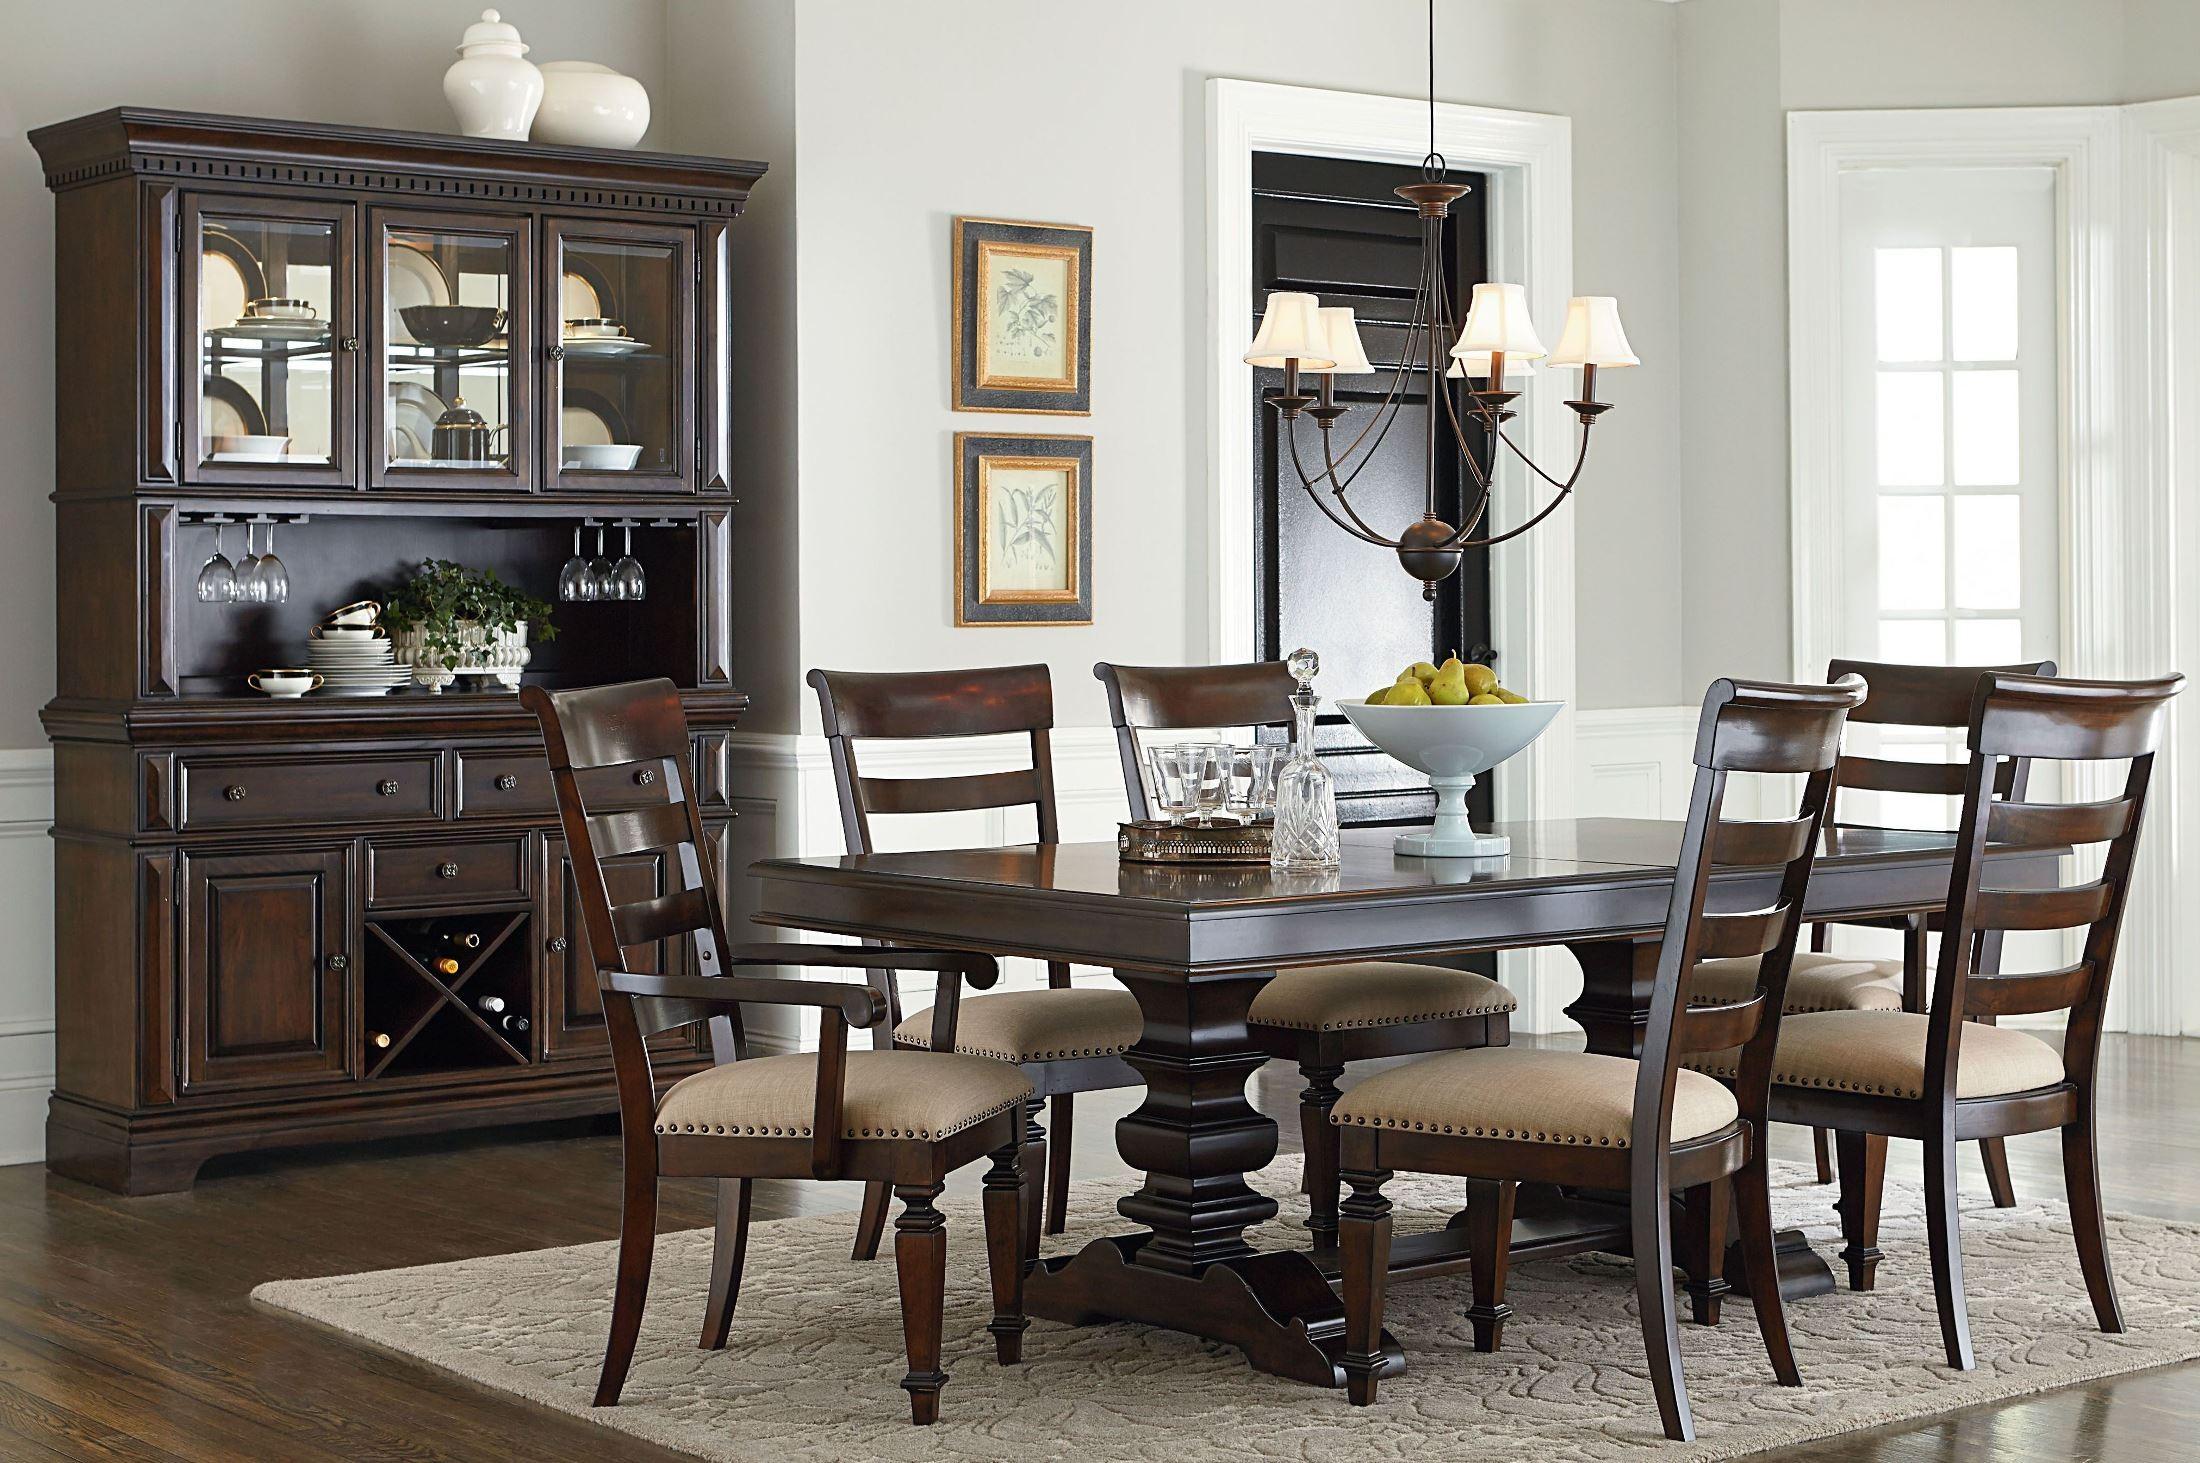 charleston tobacco brown extendable trestle dining table 16721 2016721 standard furniture. Black Bedroom Furniture Sets. Home Design Ideas